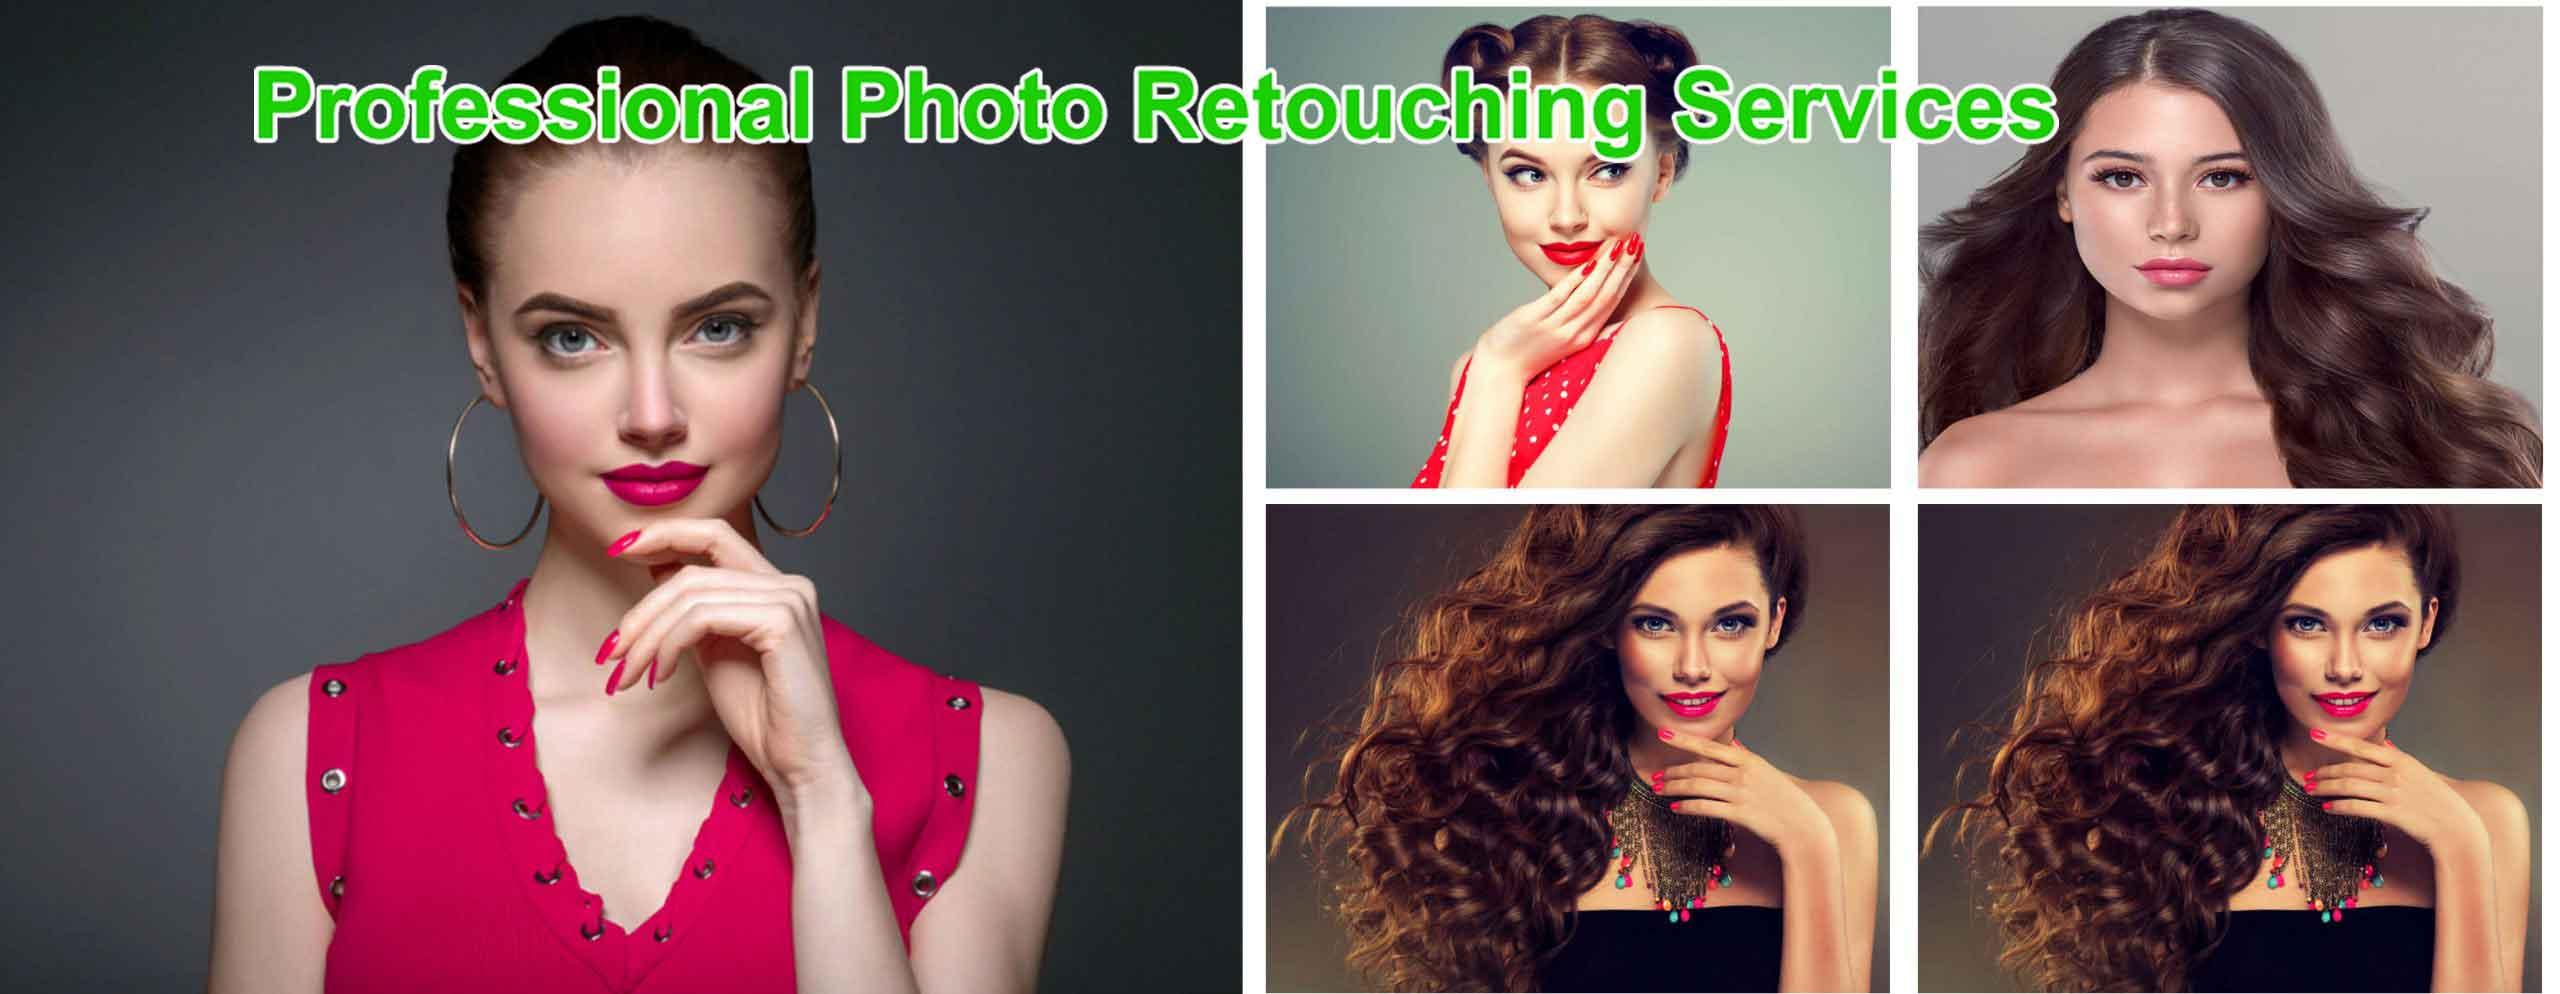 professional photoshop image retouching services_1